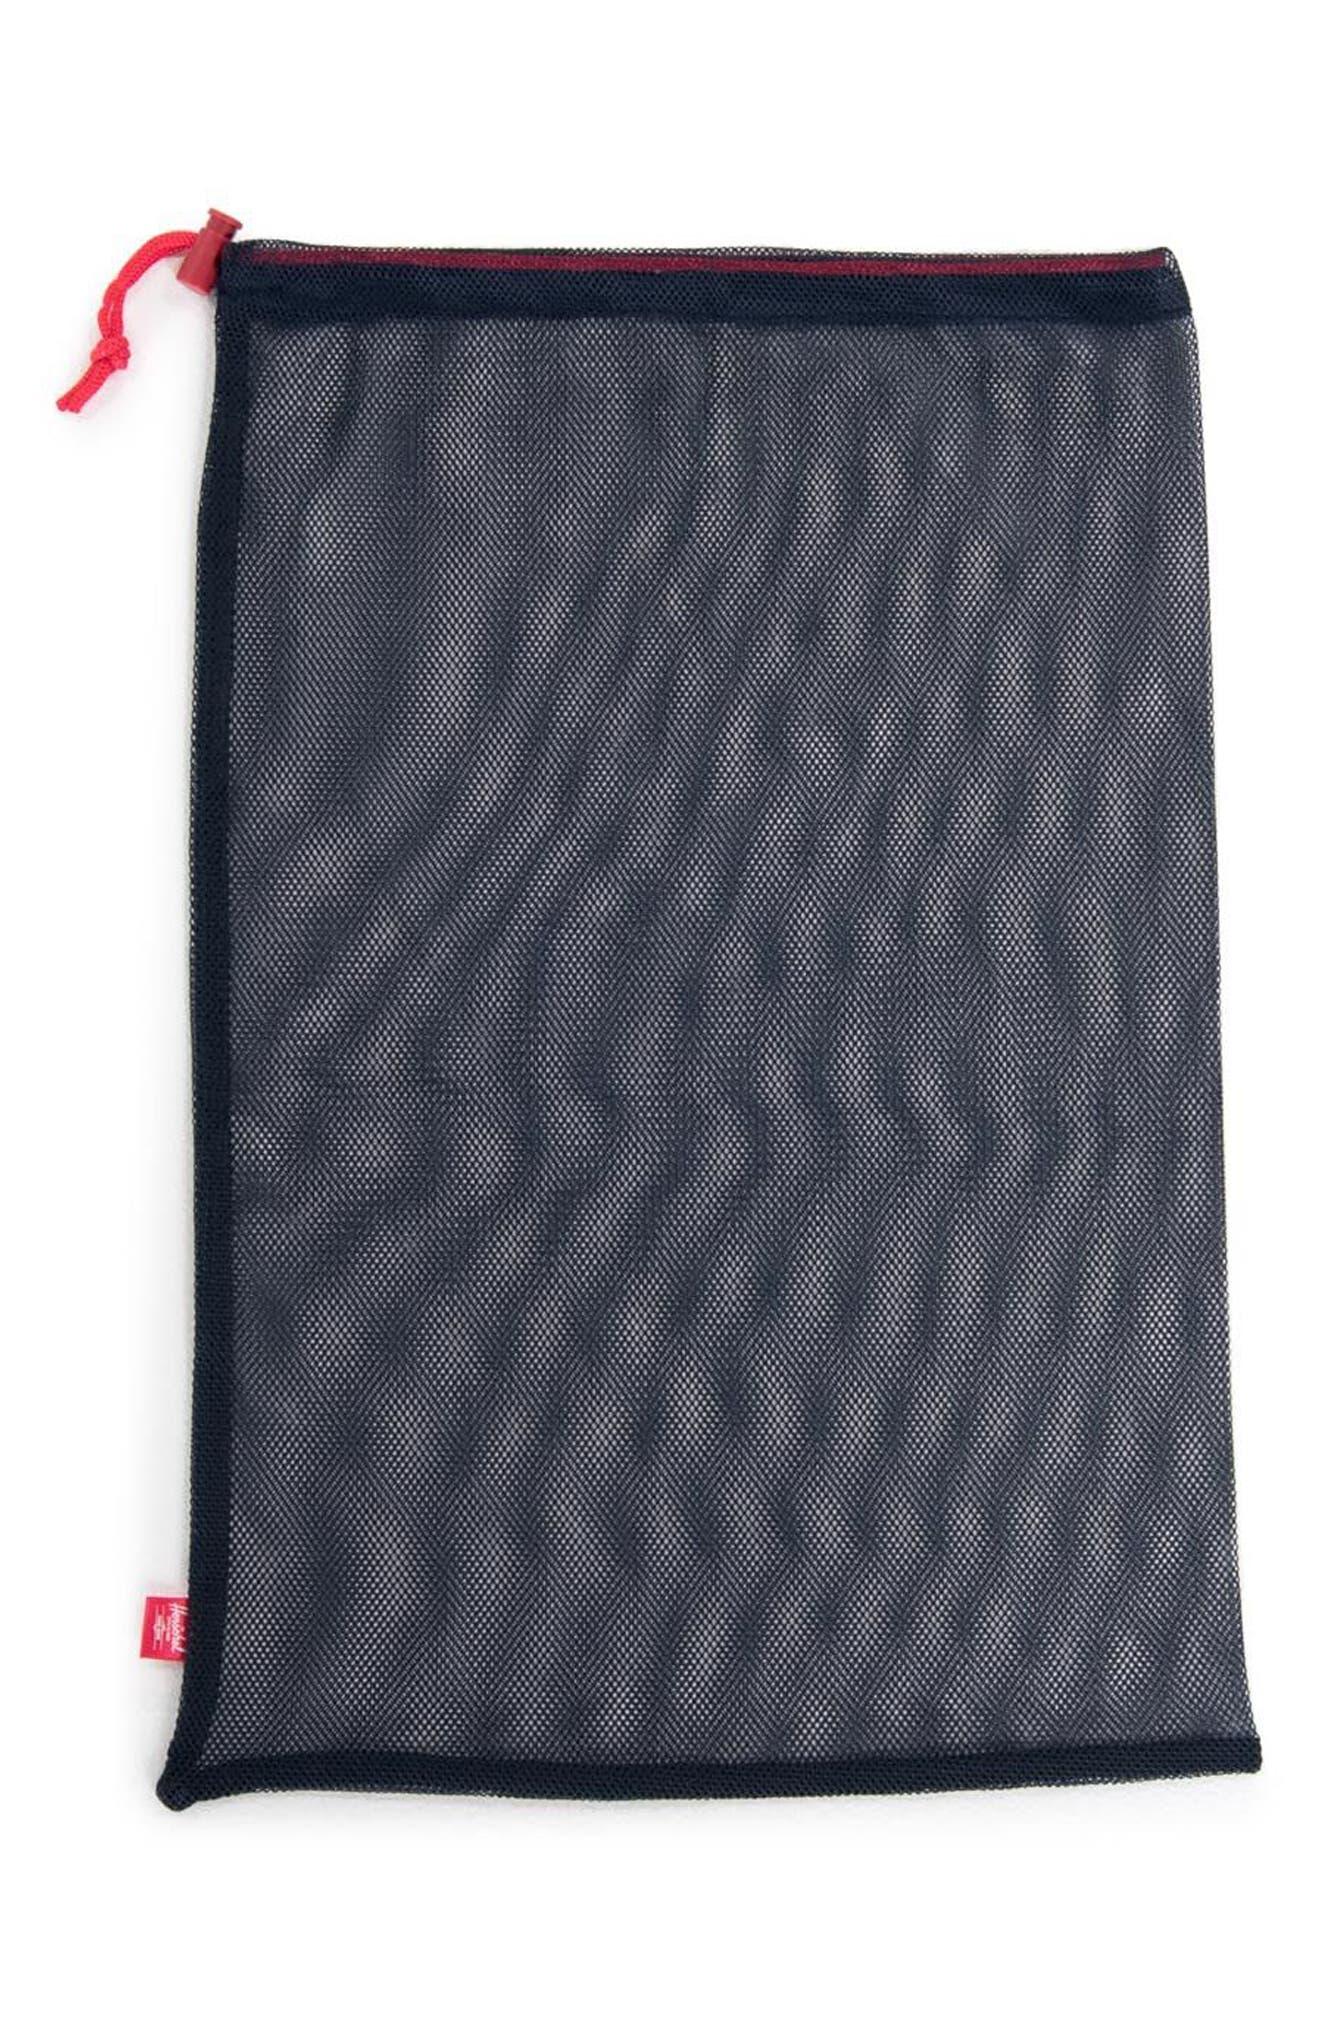 Laundry Bag Set,                             Alternate thumbnail 2, color,                             NAVY/ RED